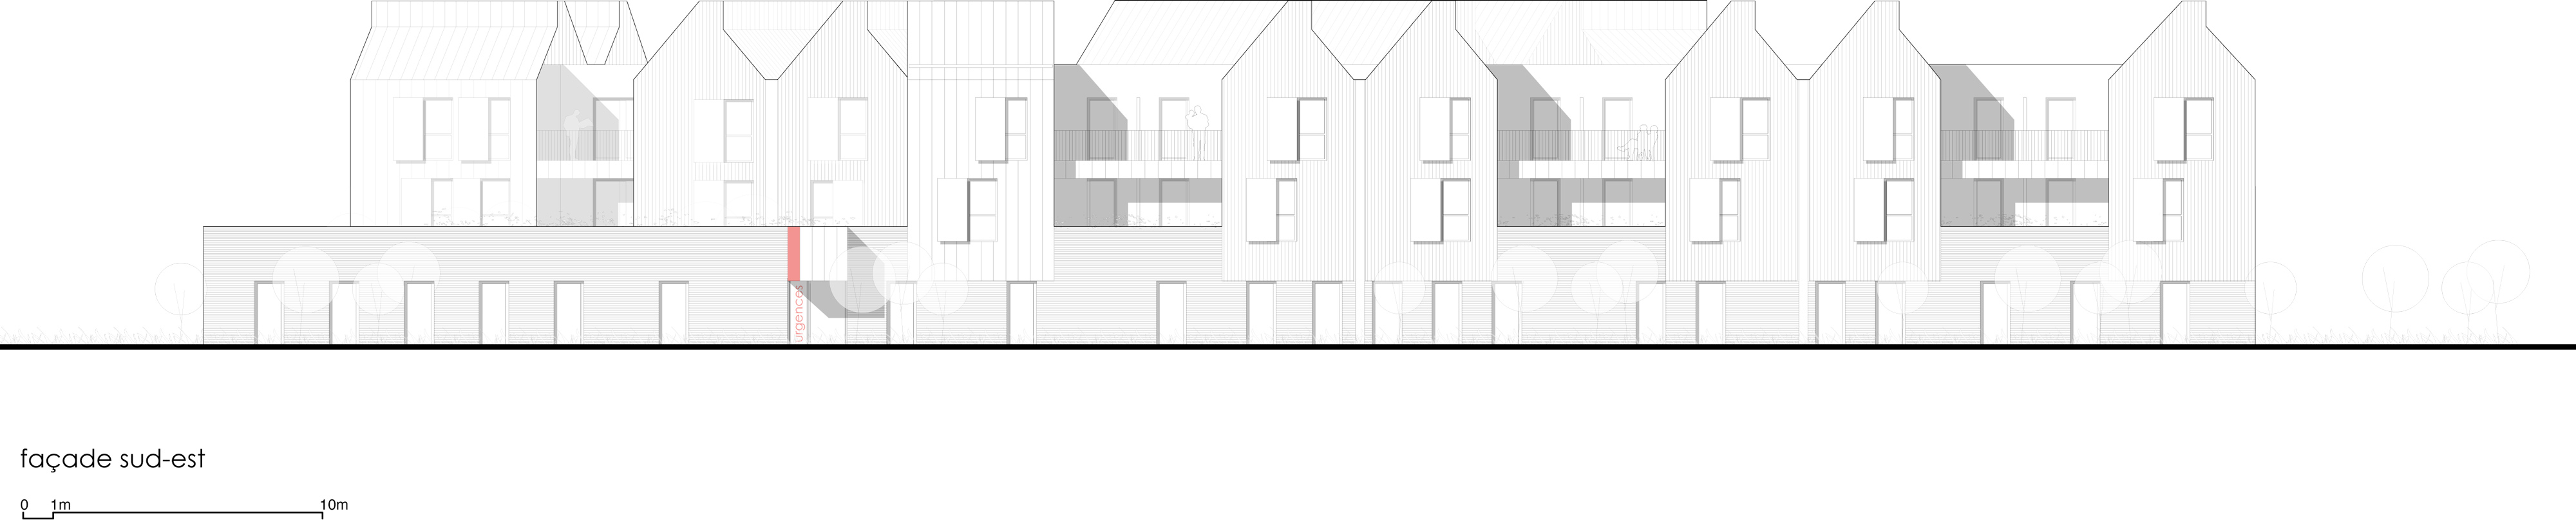 facade-sud-est_auxi